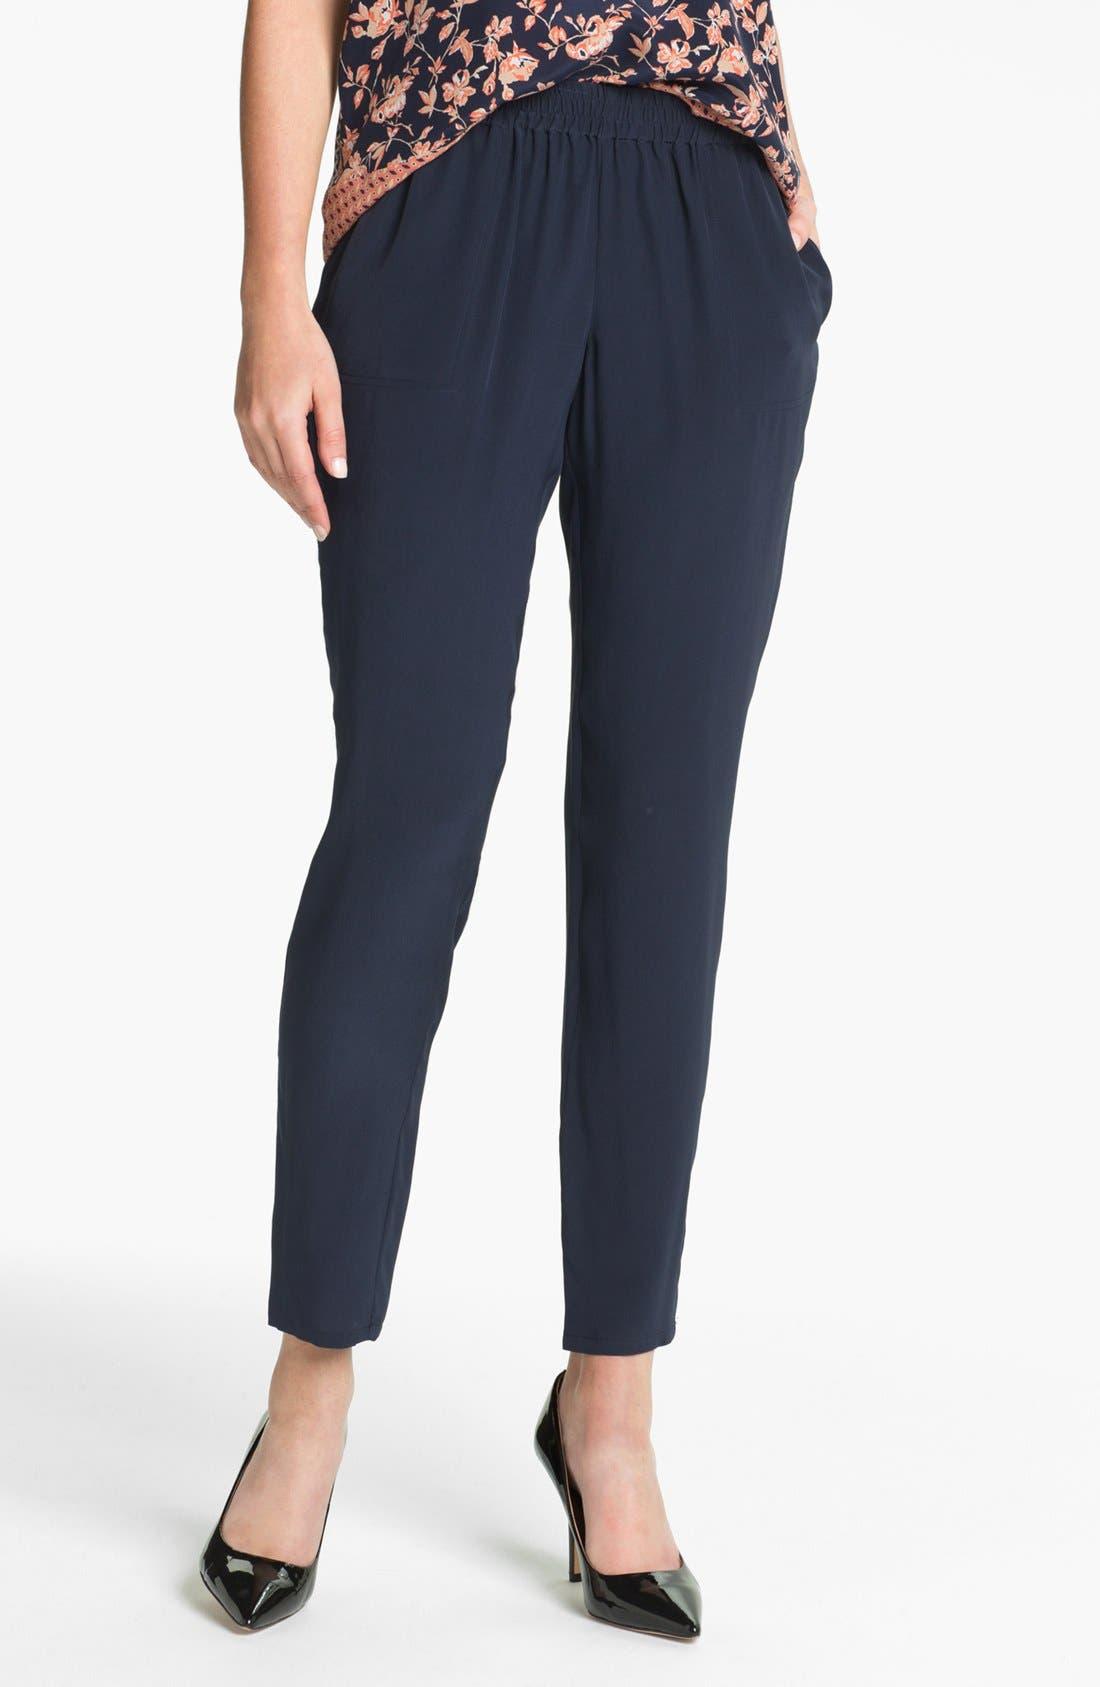 Alternate Image 1 Selected - Joie 'Julietta' Silk Pants